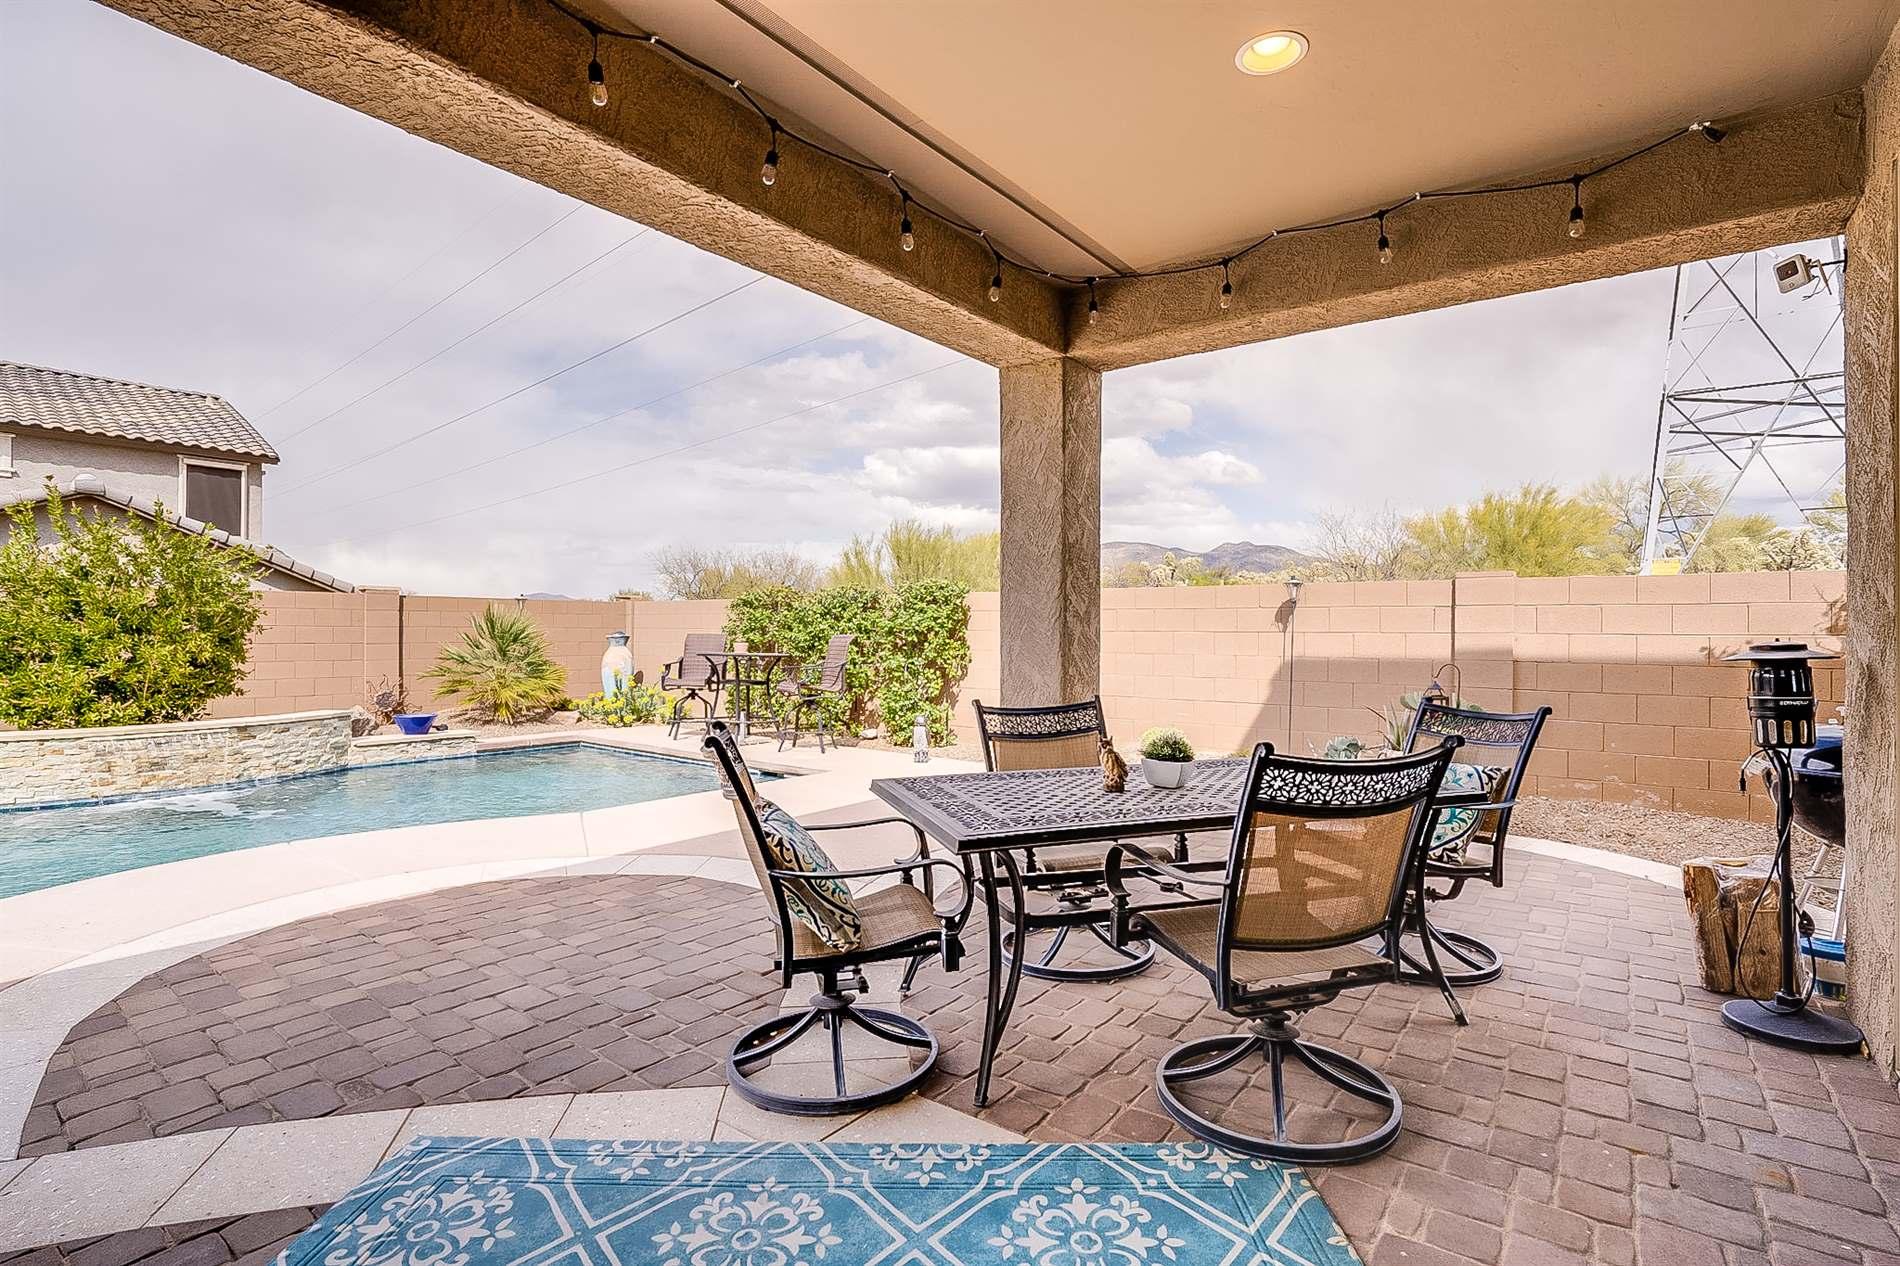 11075 E Ava Marie Pl, Tucson, AZ 85747